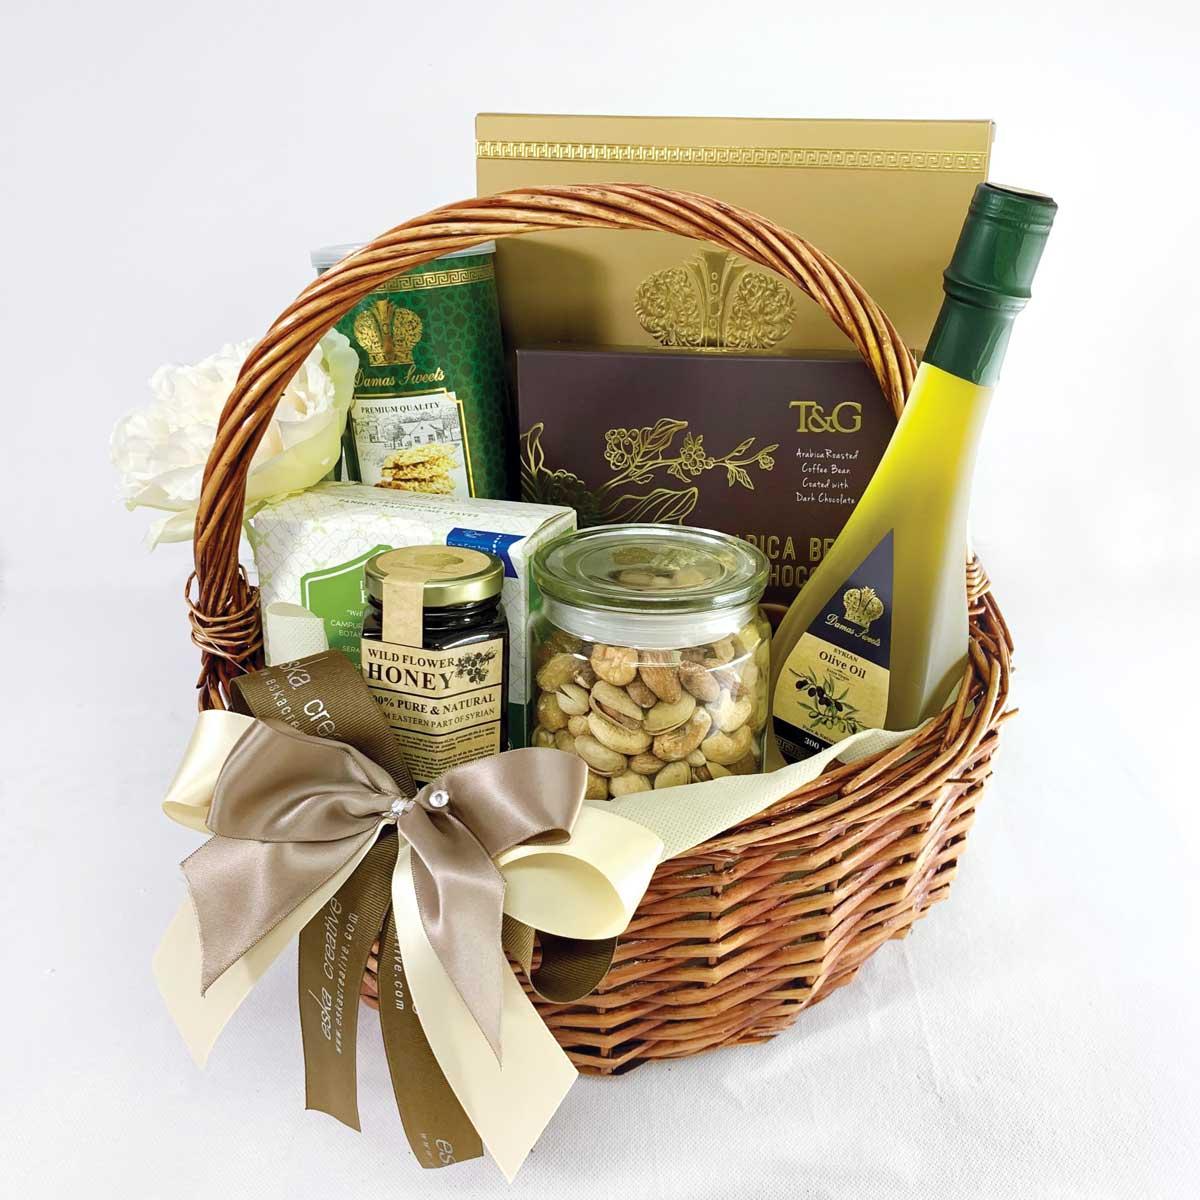 Tea and Savory | Food Hampers Gifts | Eska Creative Gifting